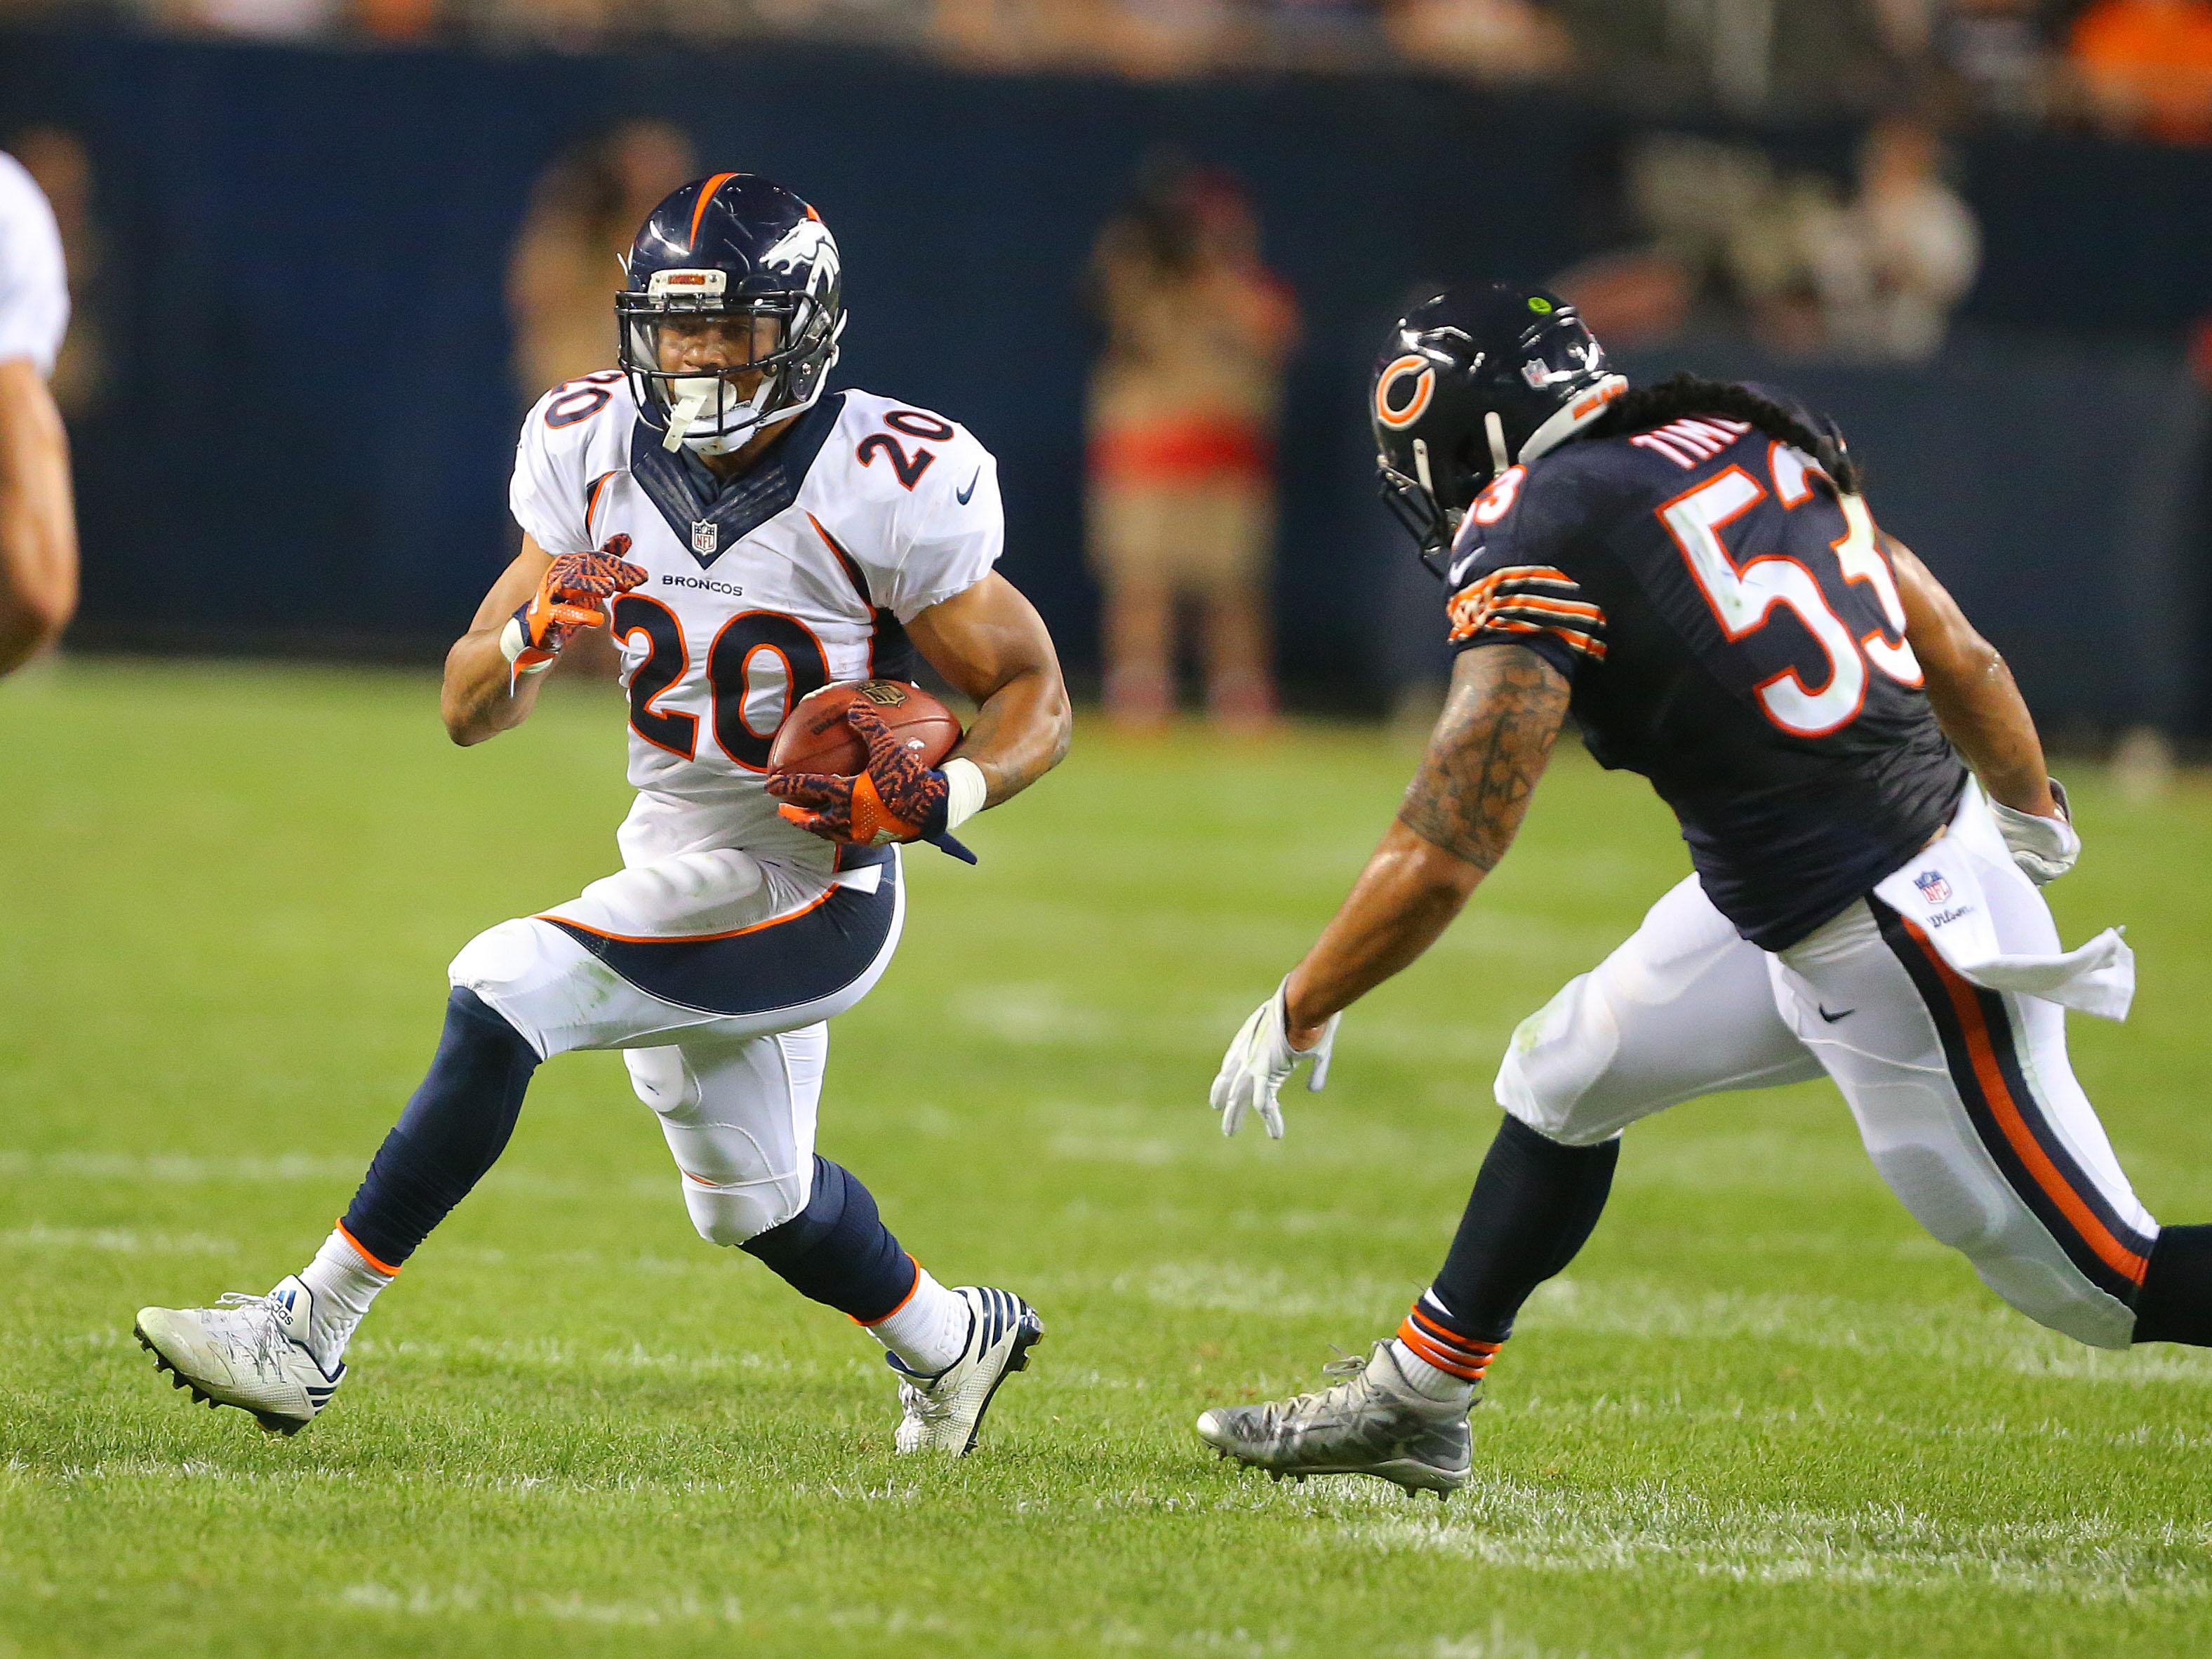 Aug 11, 2016; Chicago, IL, USA; Denver Broncos running back Devontae Booker (20) runs against Chicago Bears inside linebacker John Timu (53) during the second half at Soldier Field. Denver won 22-0. Mandatory Credit: Dennis Wierzbicki-USA TODAY Sports